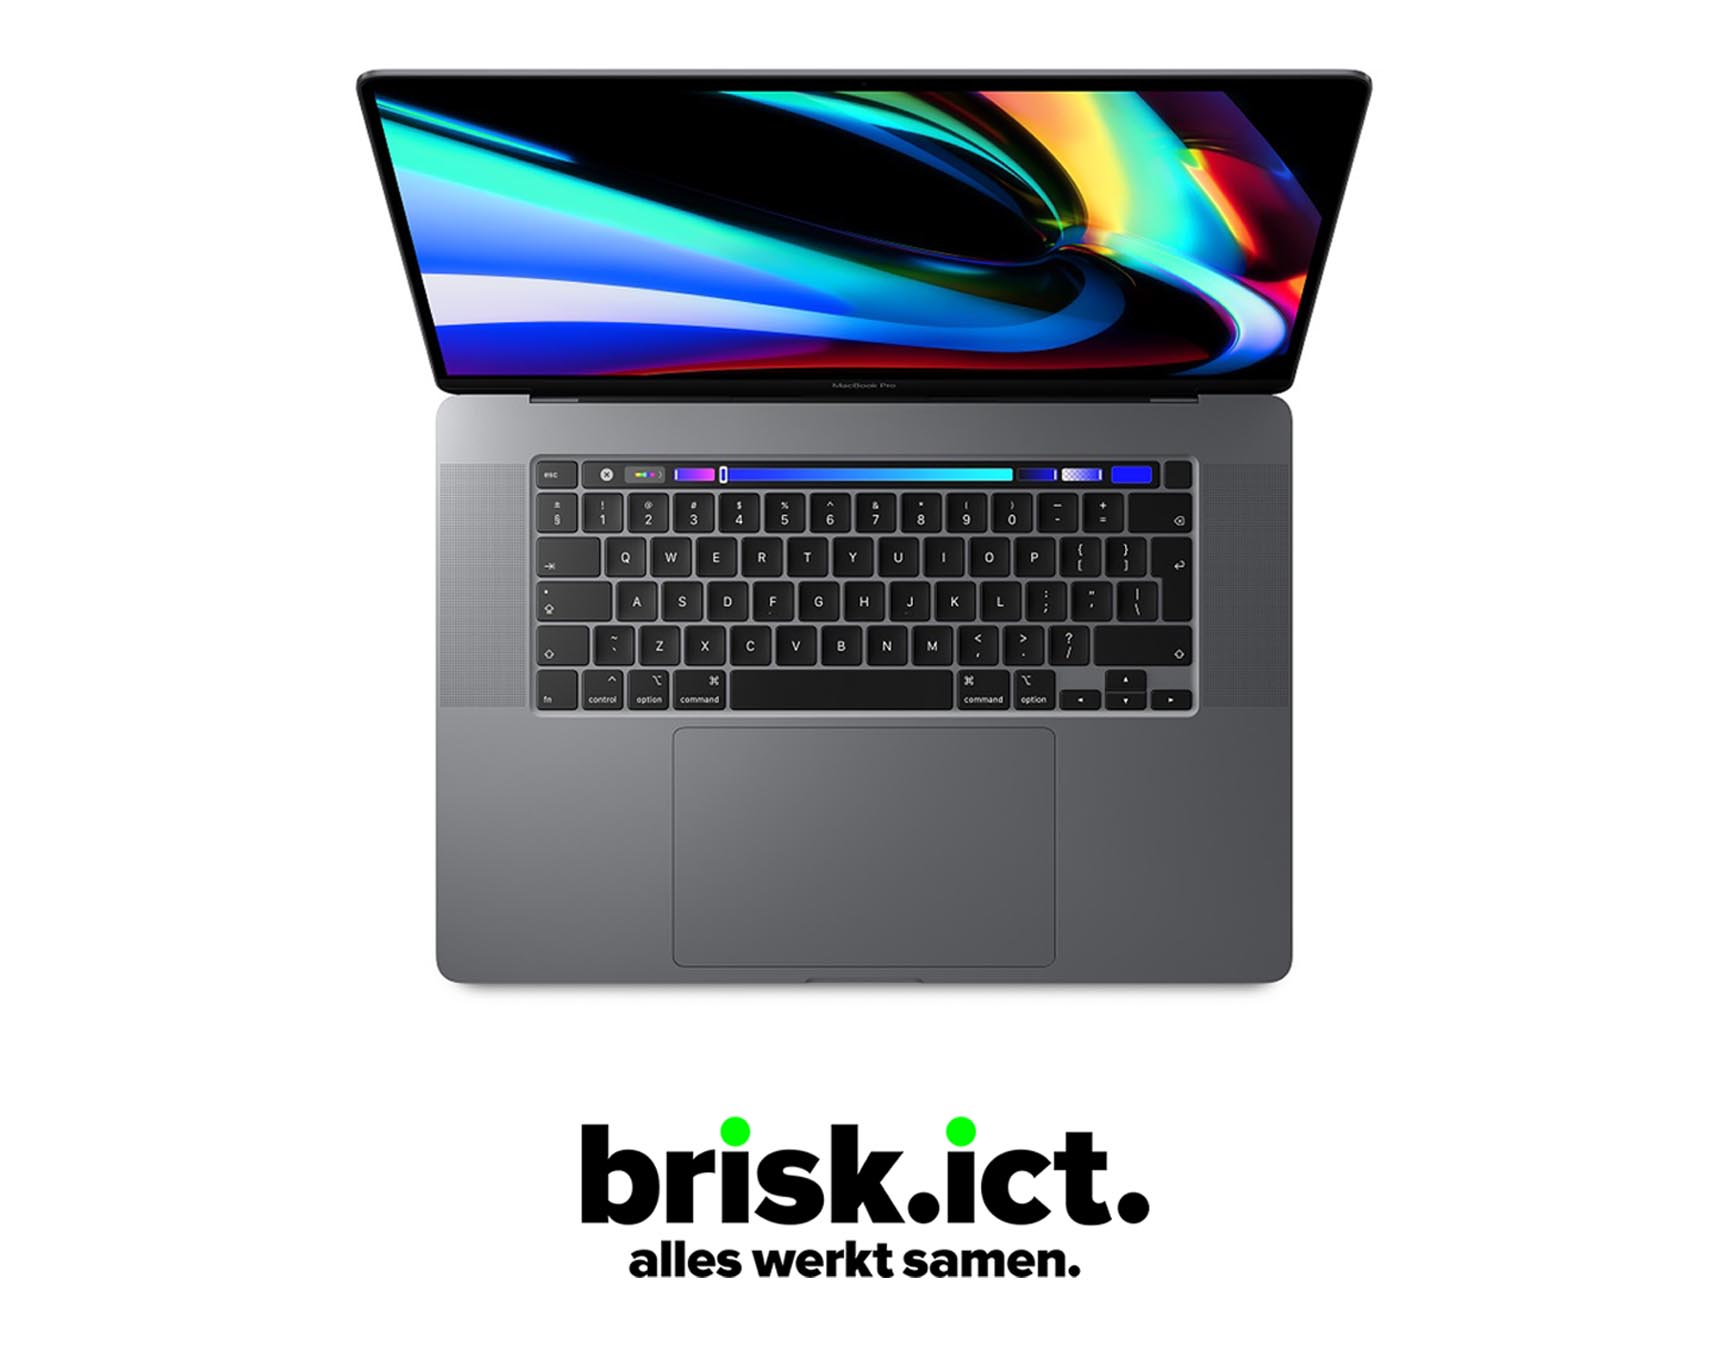 macbook_pro_16-inch_brisk_ict